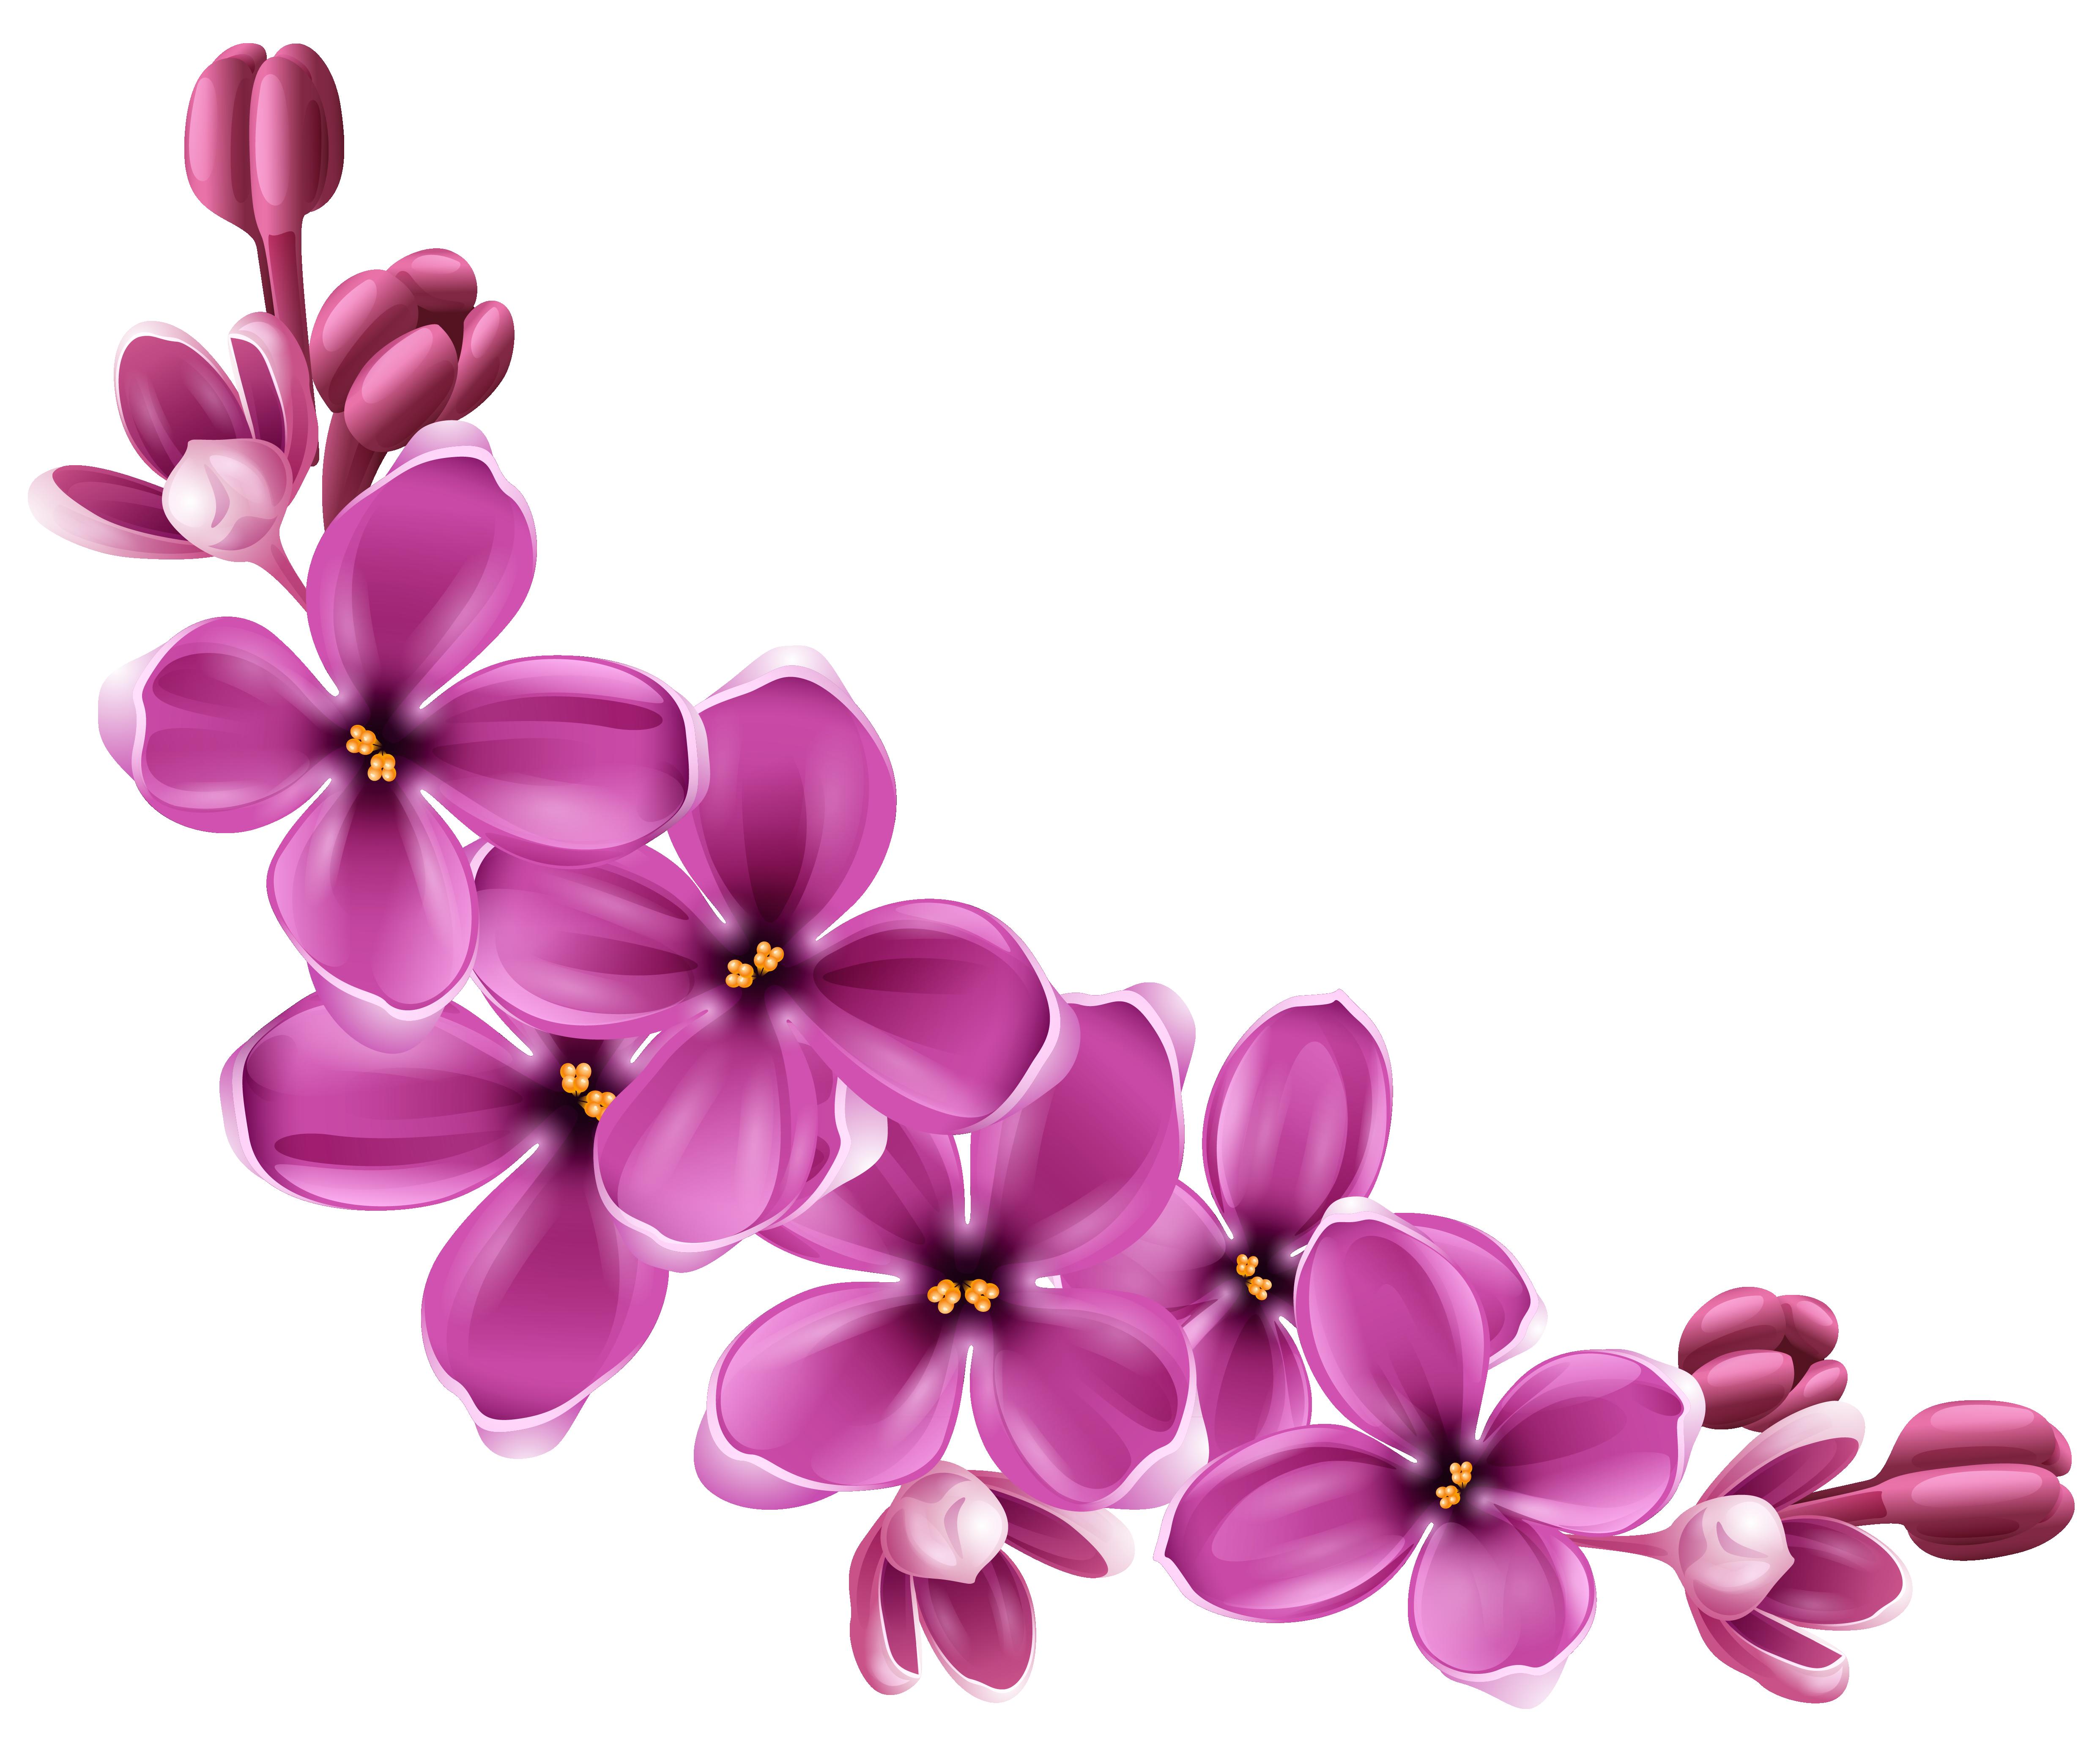 FlowersPNG9.png (4967×4131) Dibujos de flores